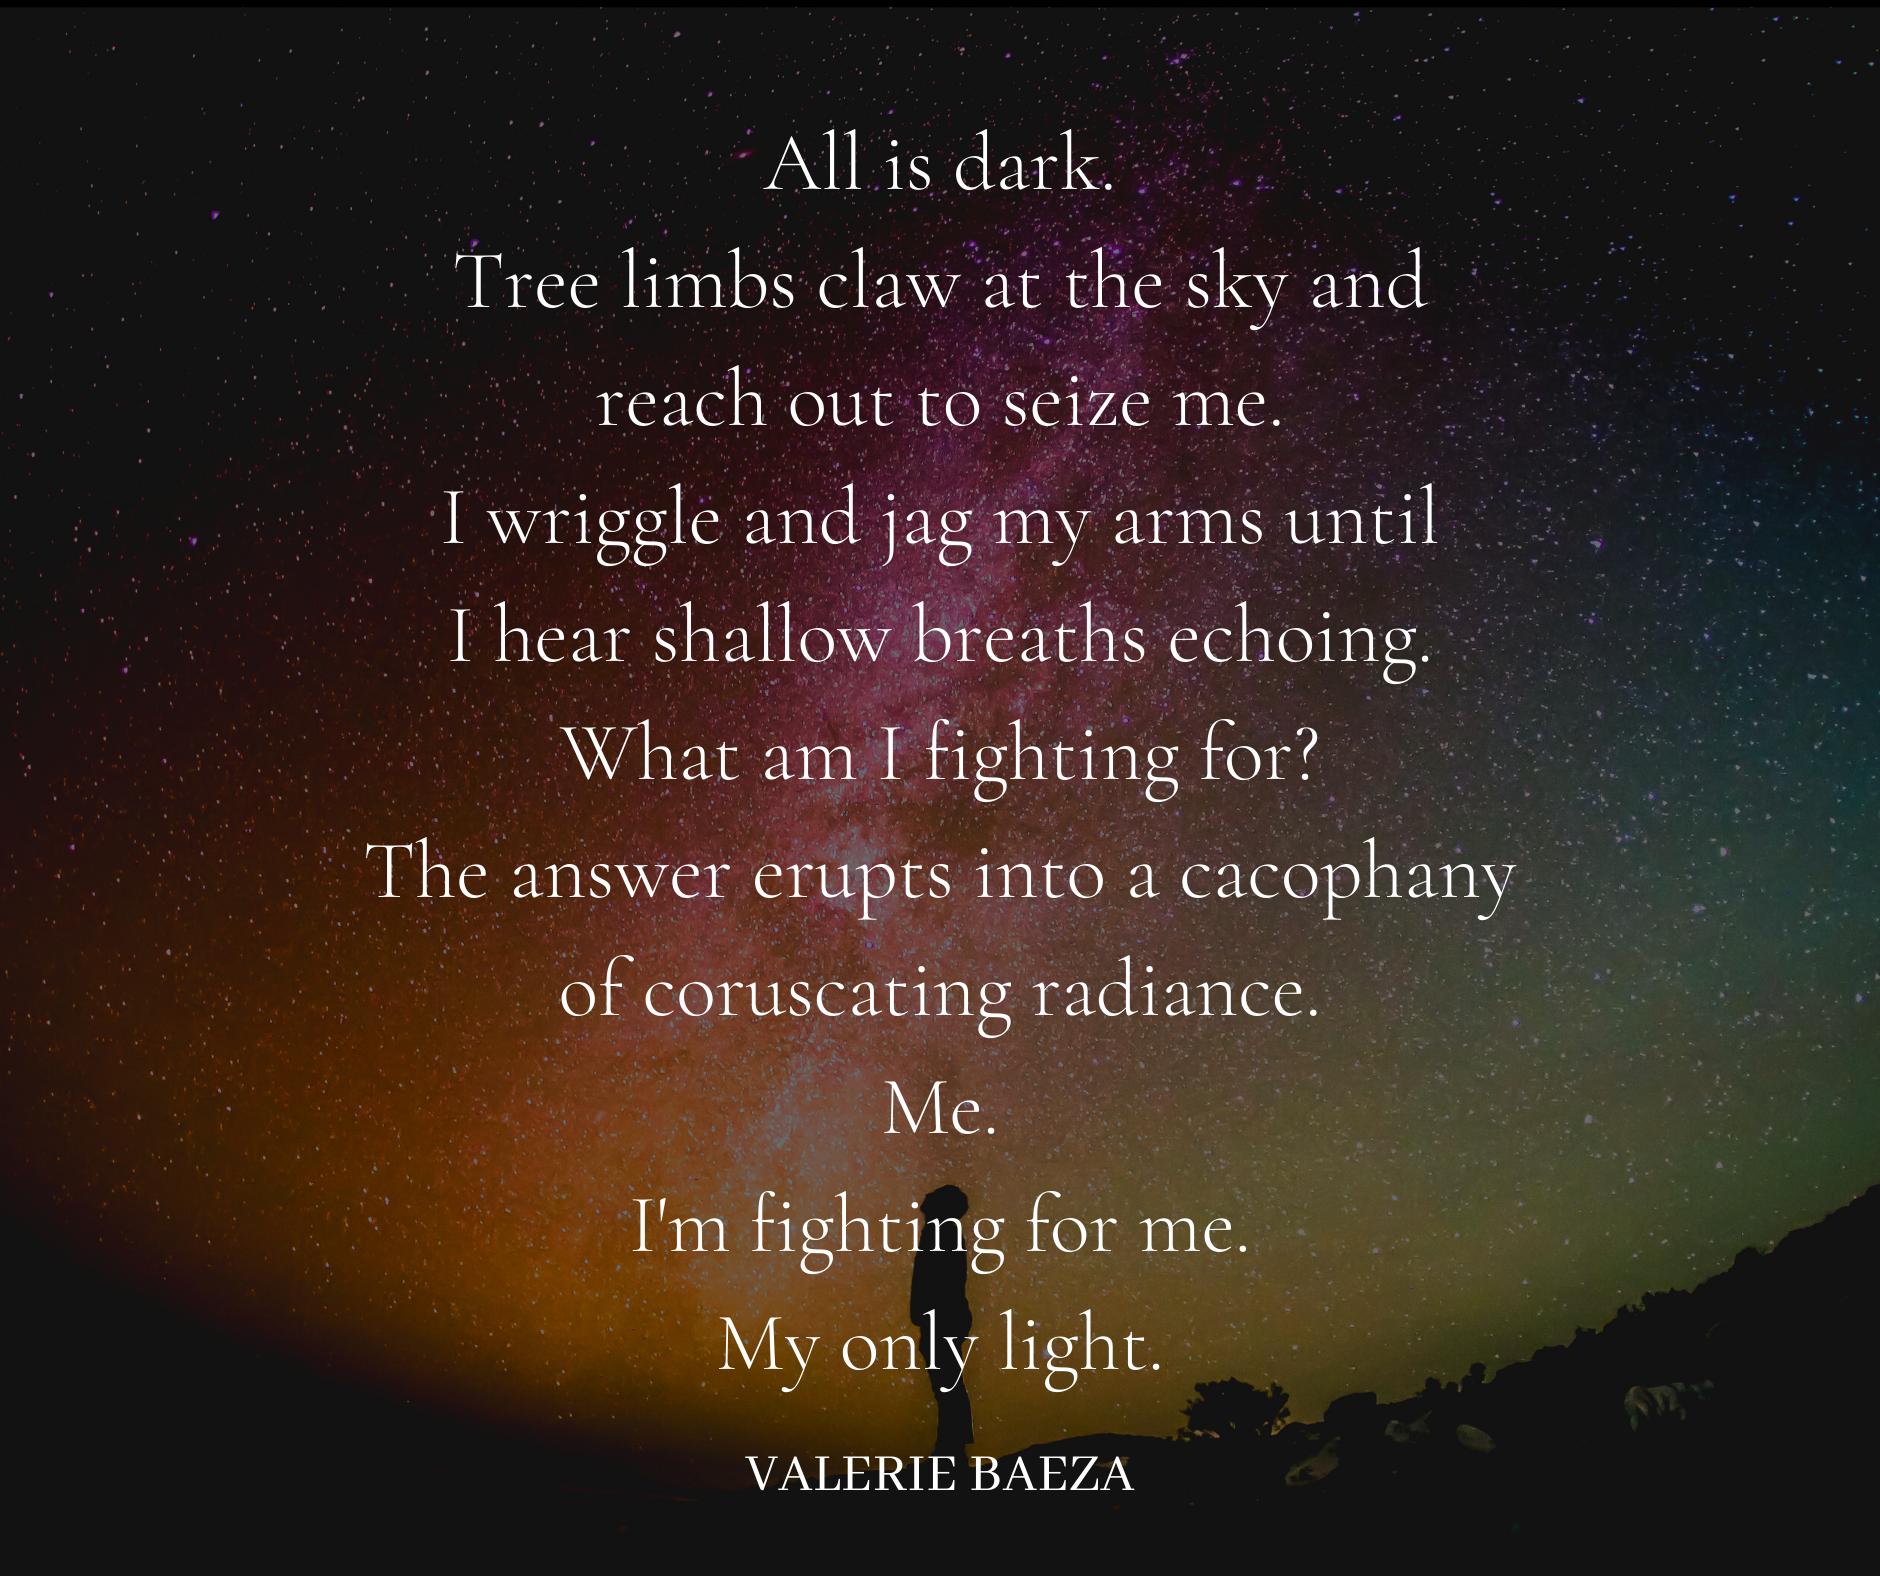 My Only Light